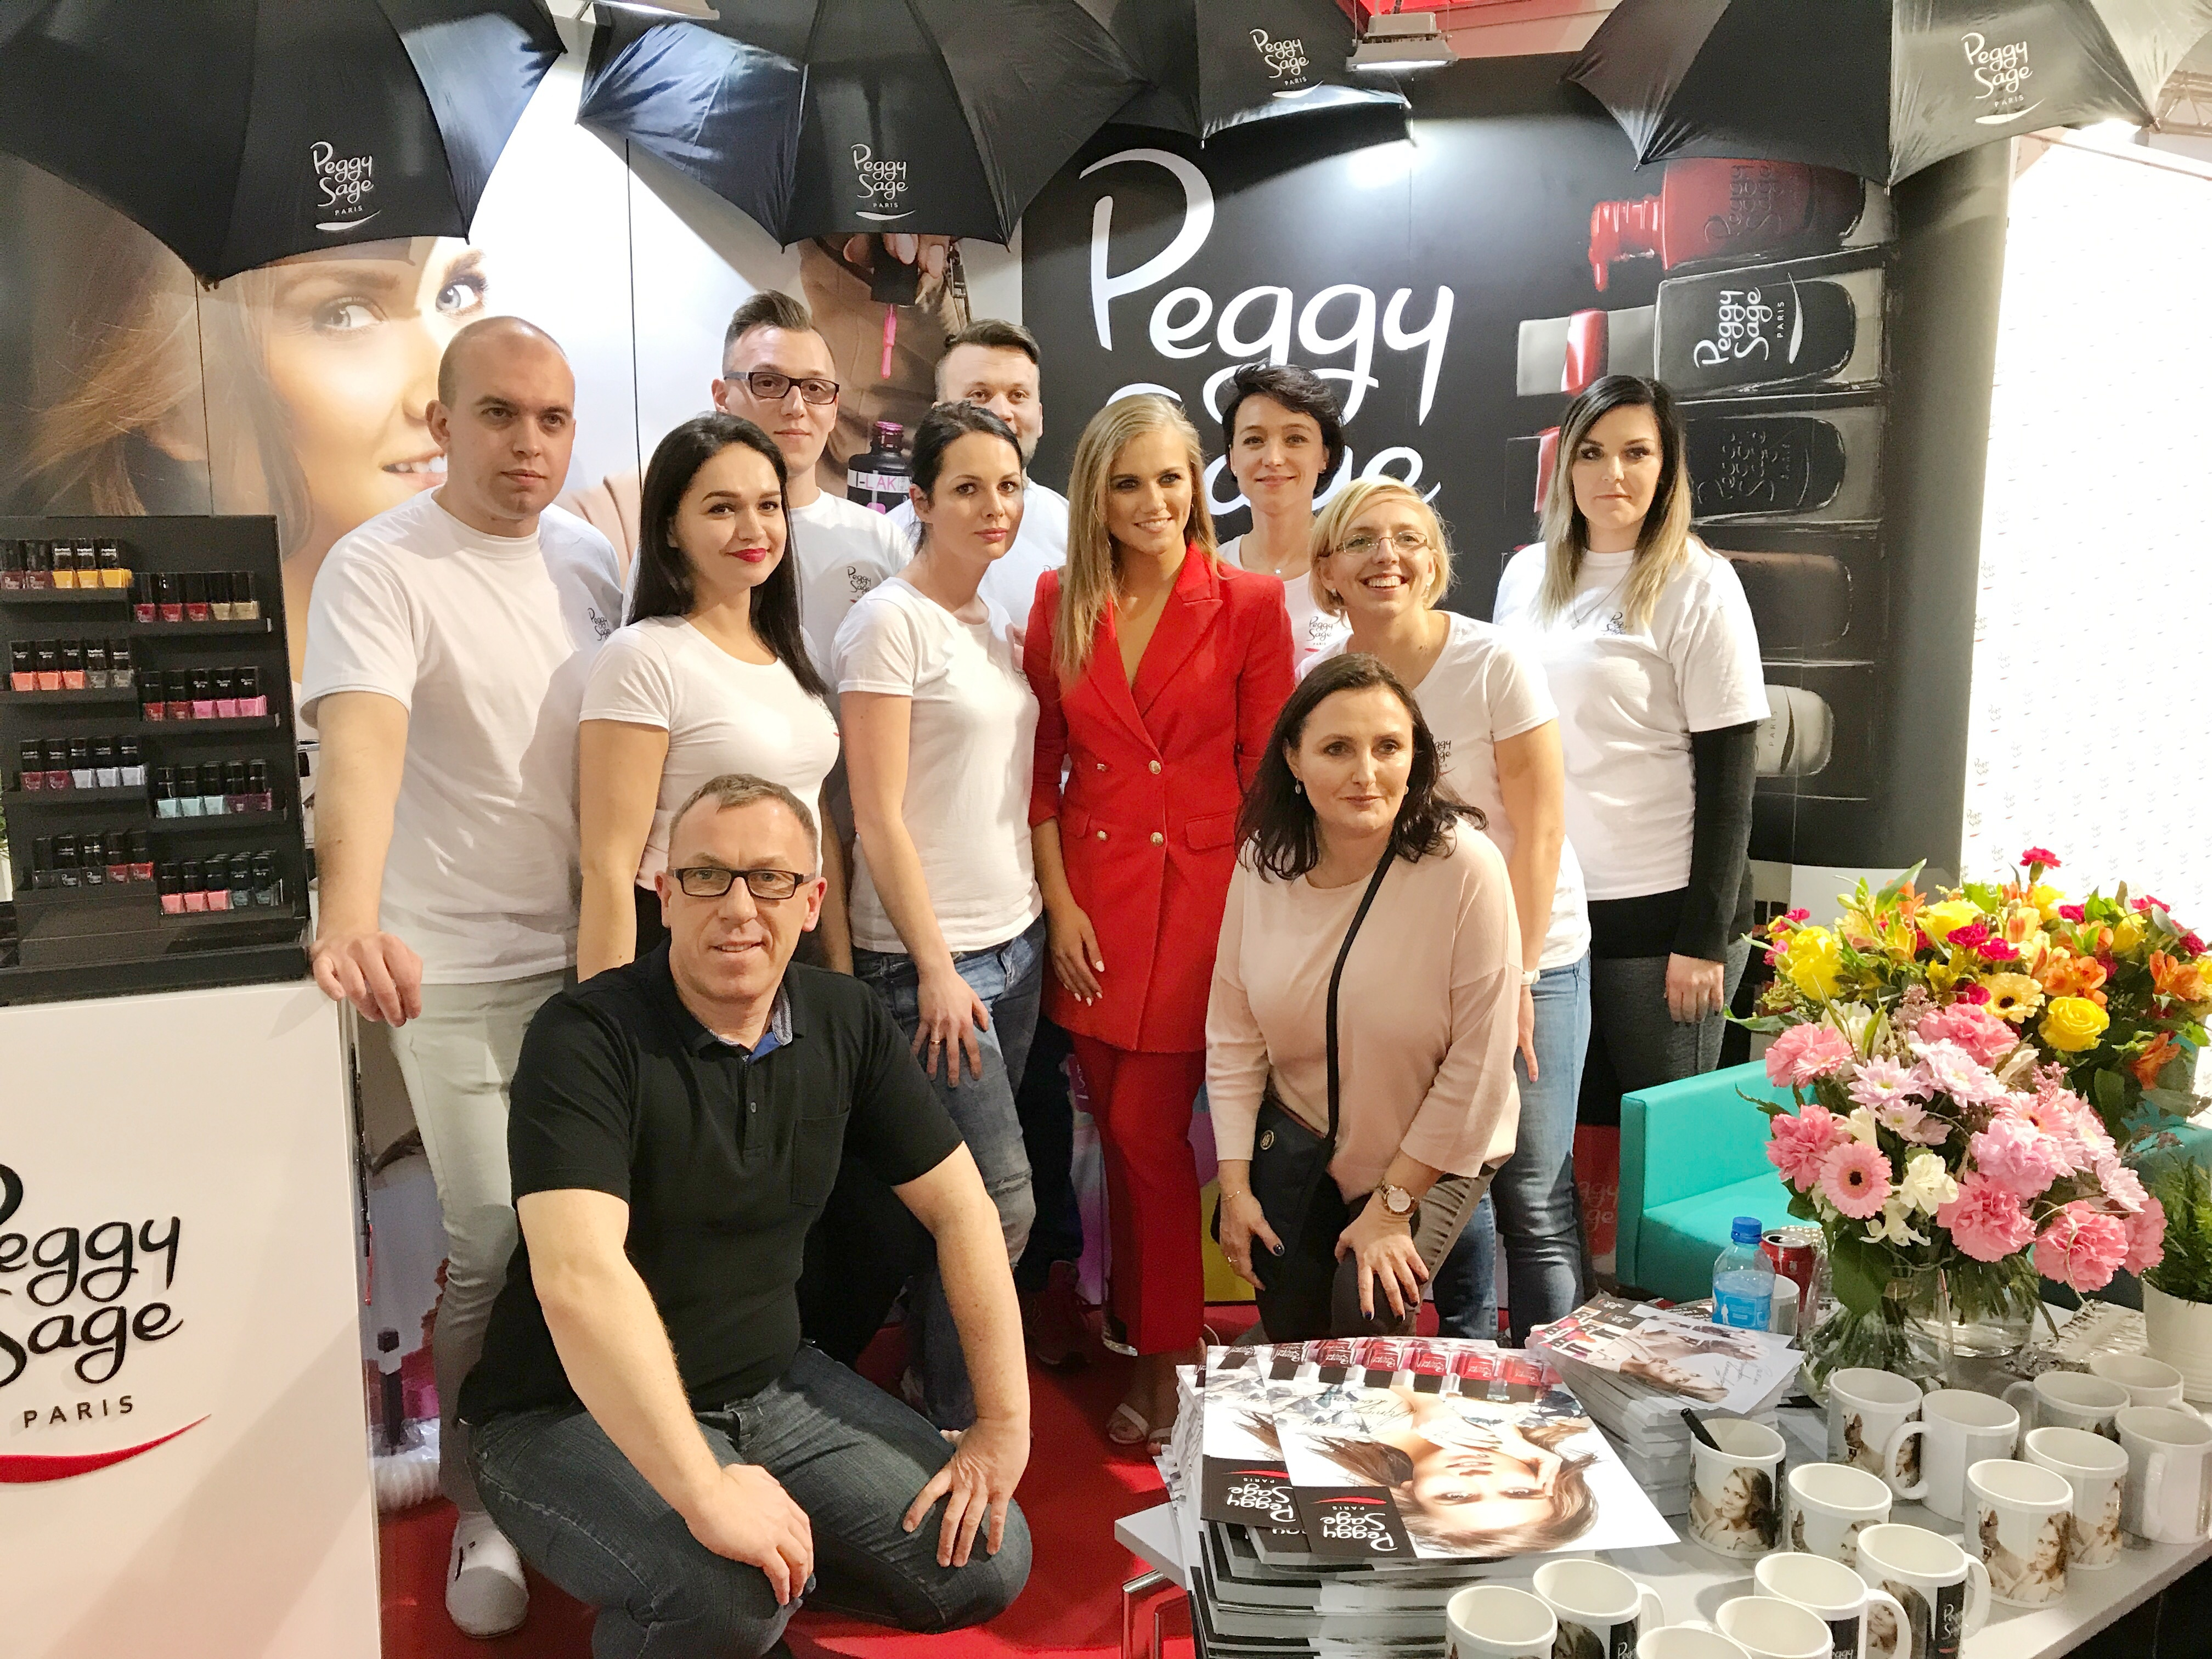 peggy_sage_Kaczorowska1